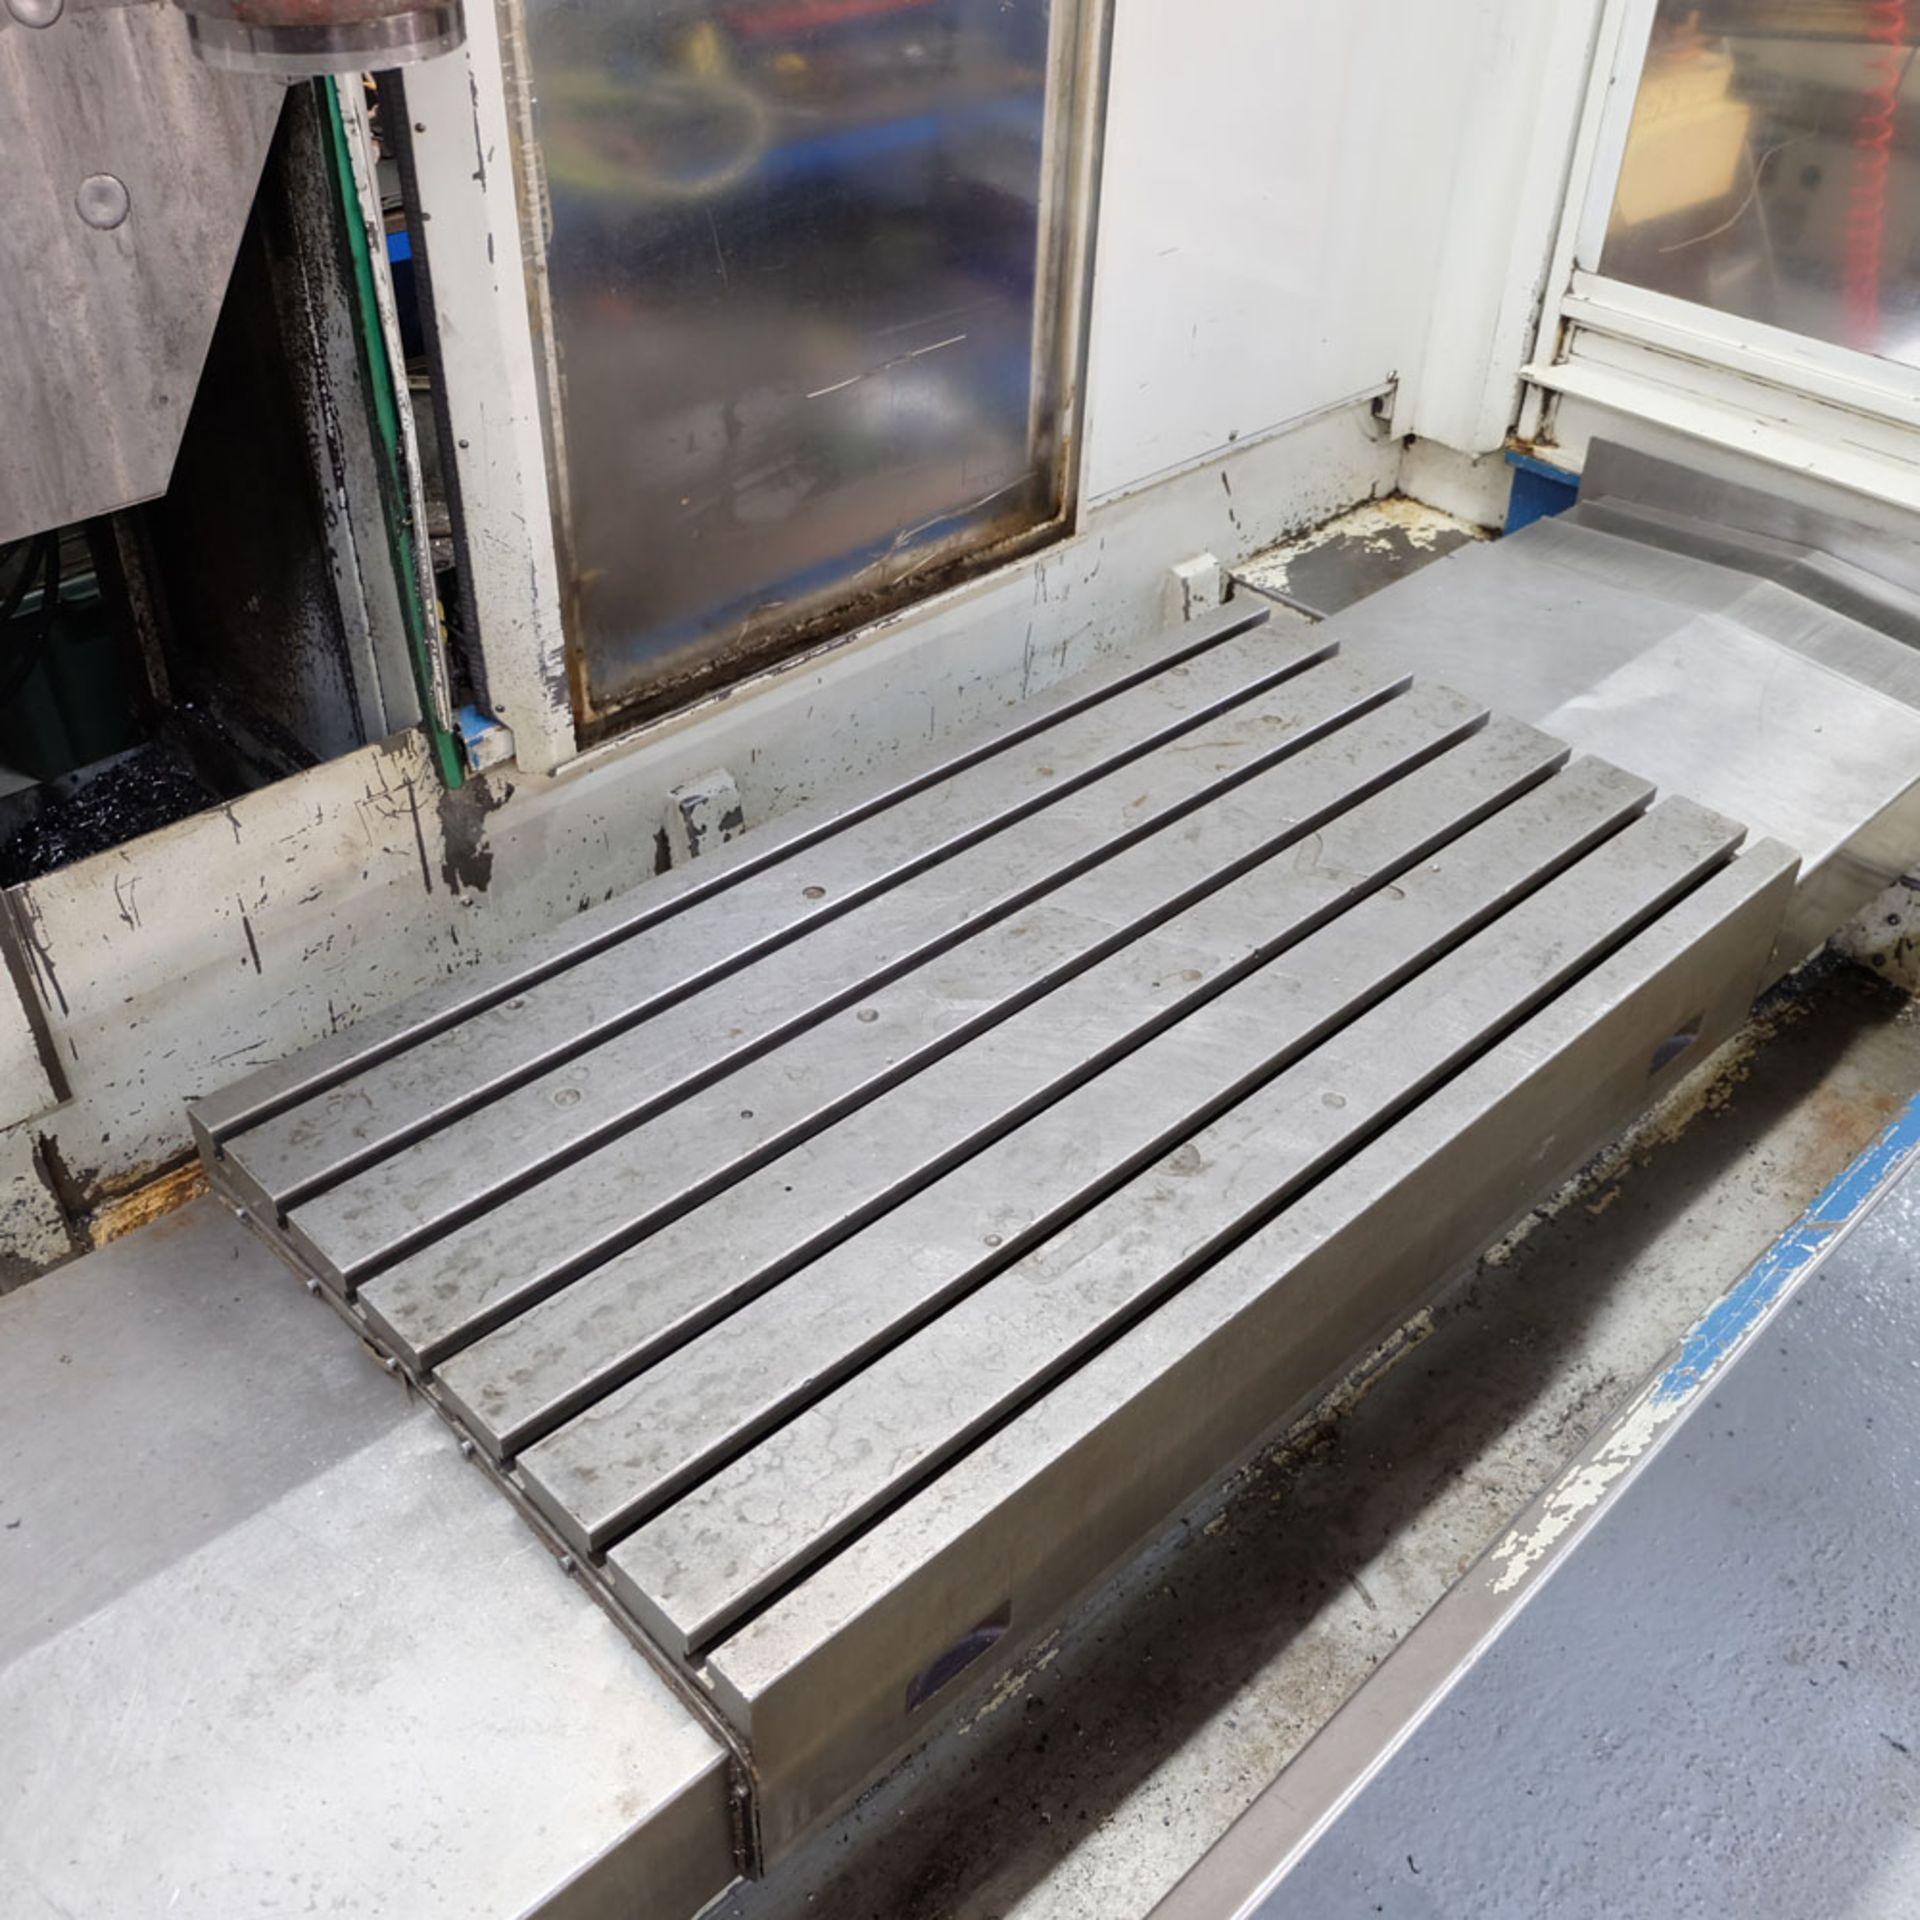 Huron GX 411 F Bed Type Milling Machine. Control Unit: CNC (HEIDENHAIN TNC 415B) - Image 4 of 12